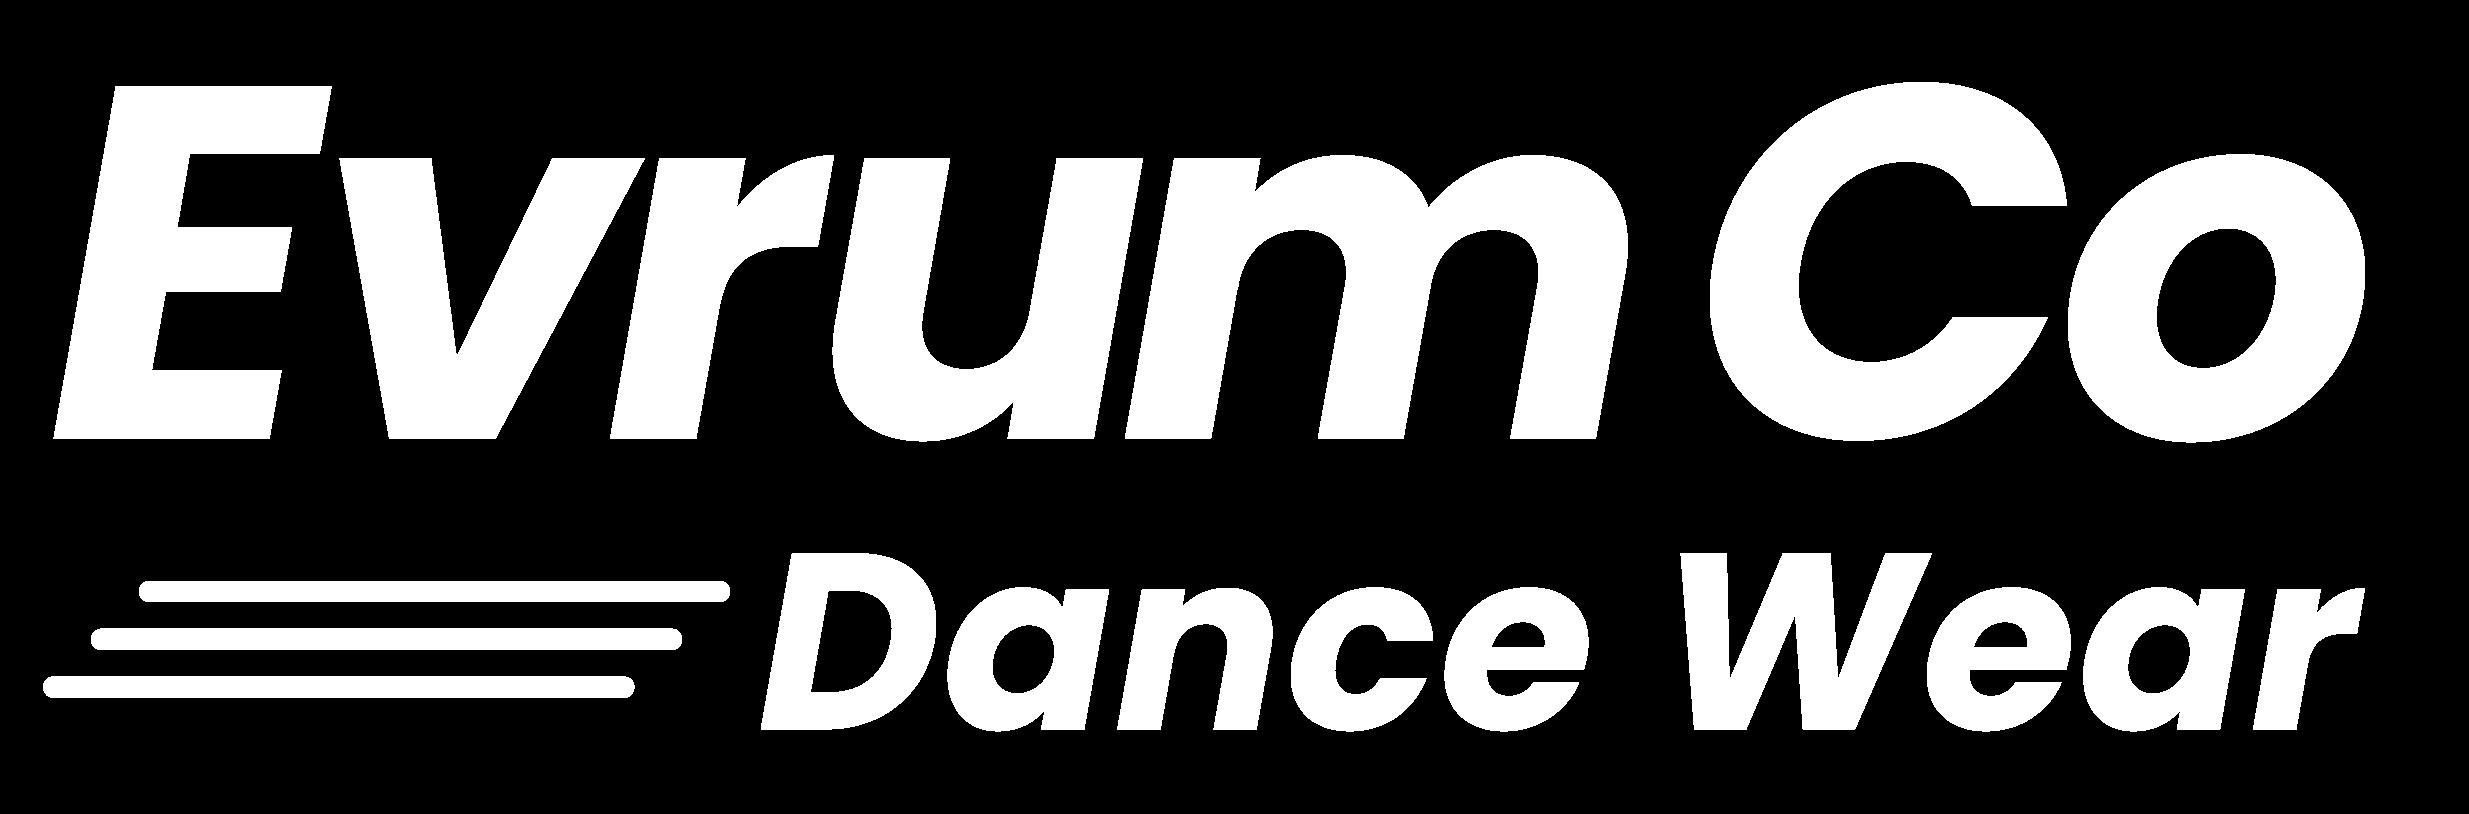 Evrum Co Dance Wear